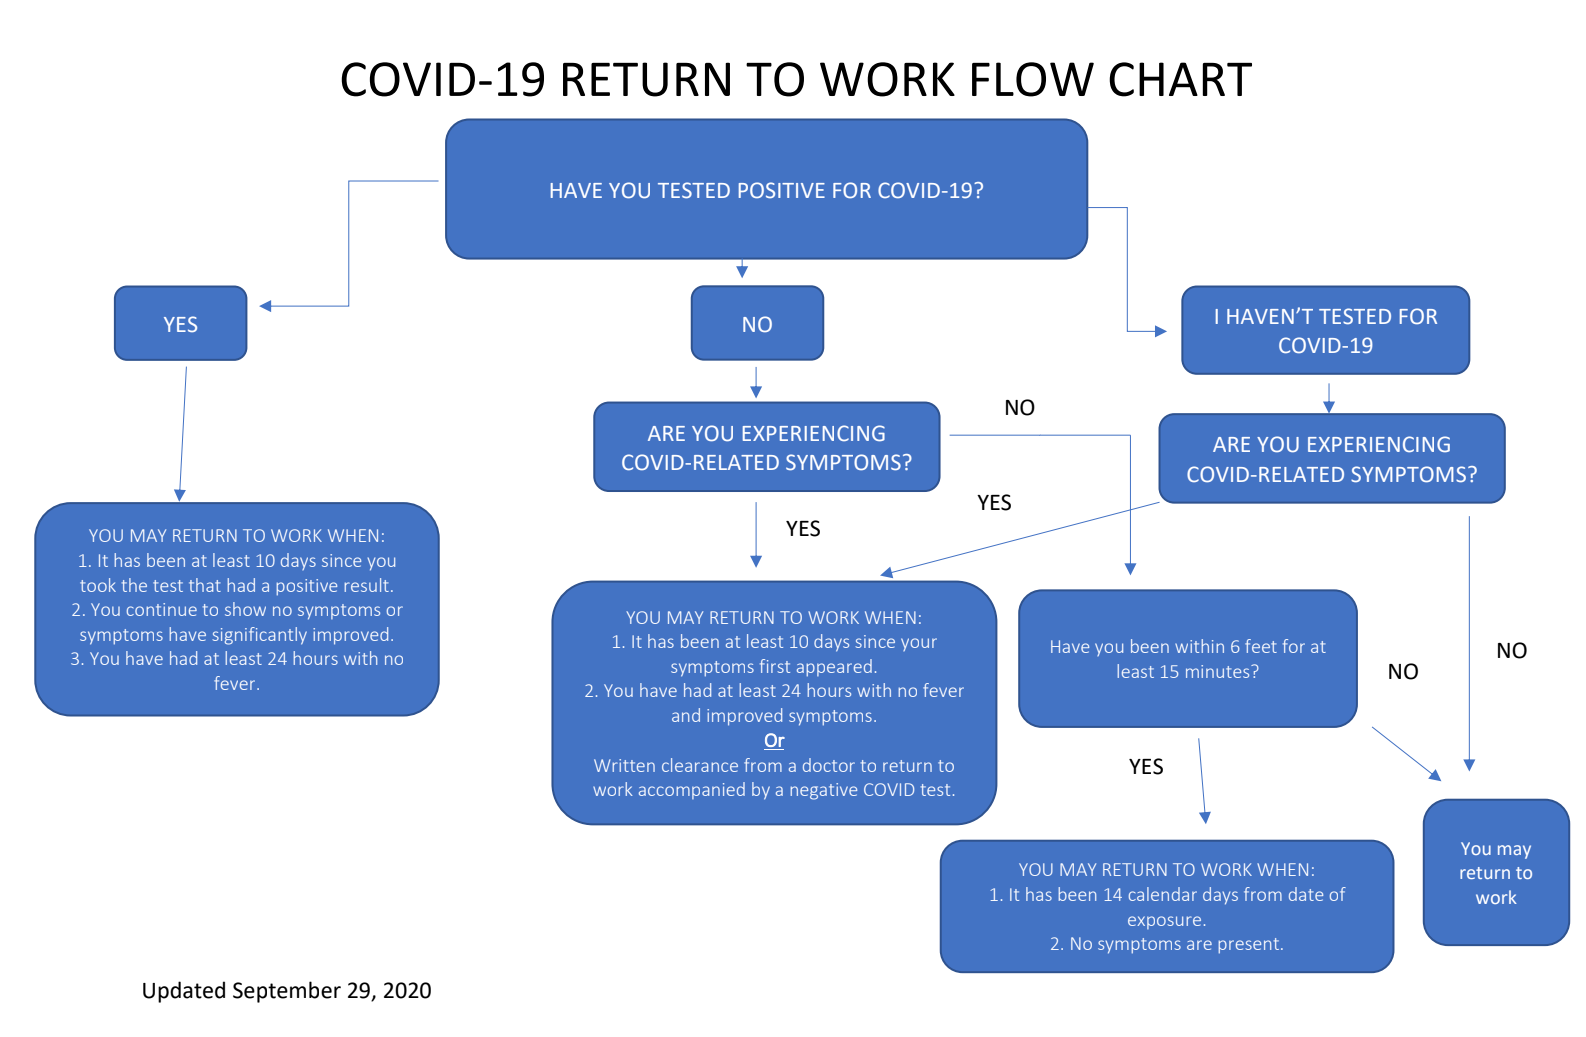 COVID-19 Return to Work Flowchart